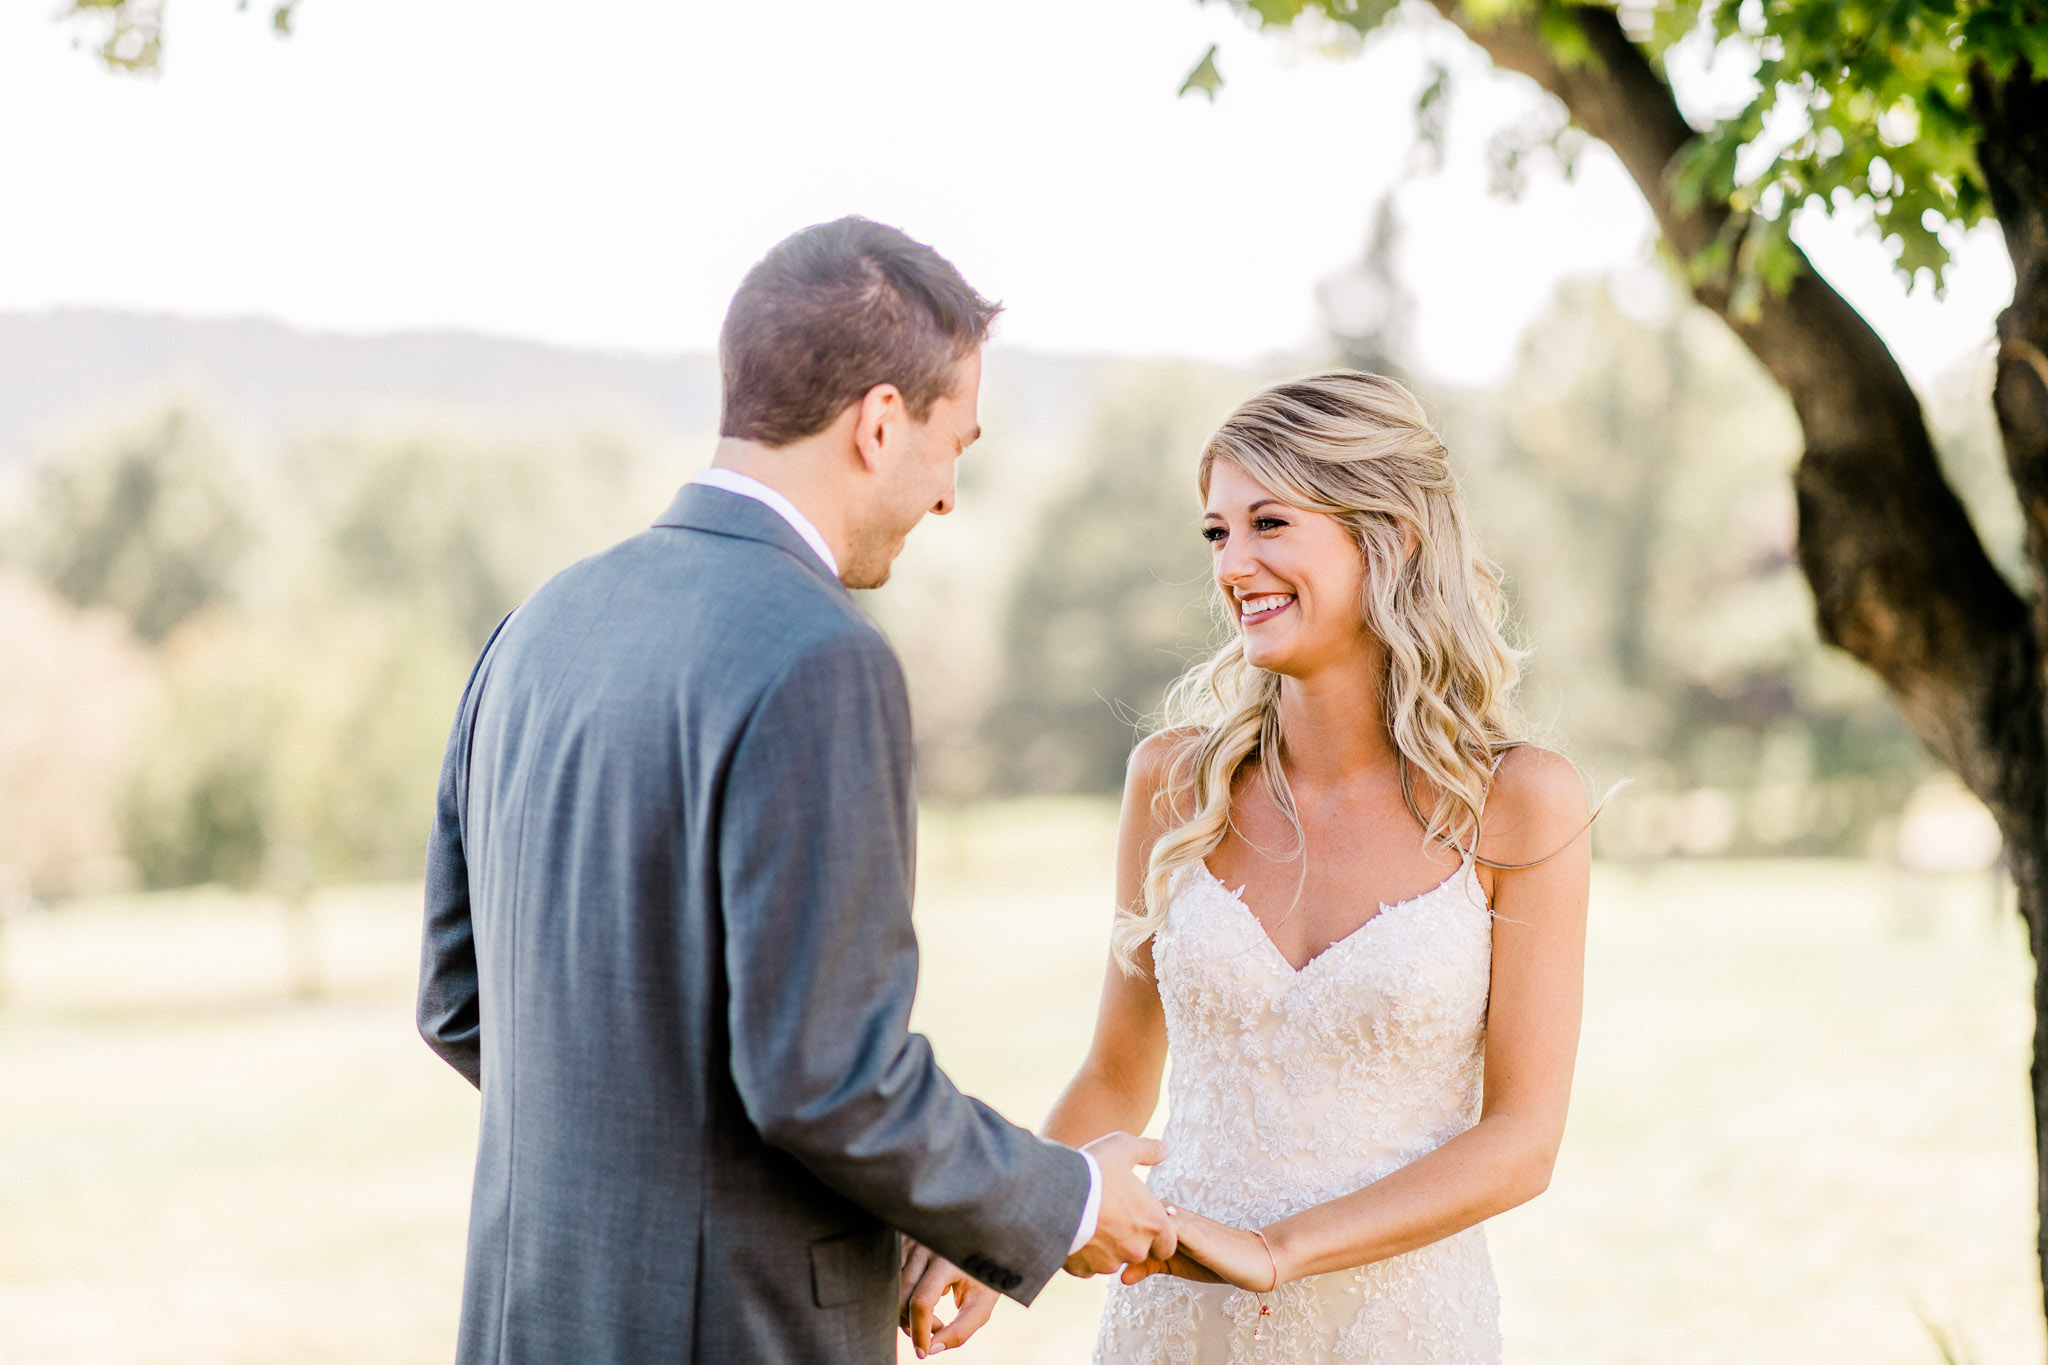 Frosty-Valley-September-Wedding-7210.jpg